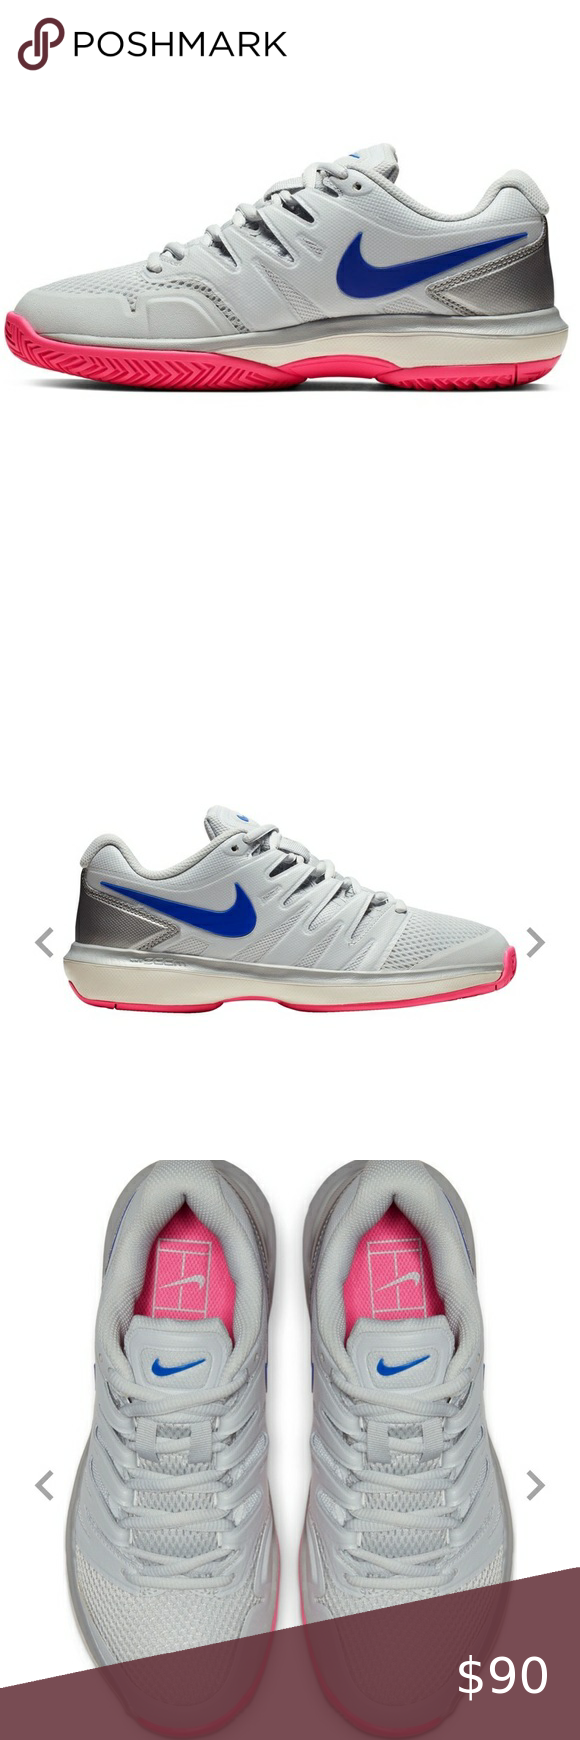 Nike Women S Air Zoom Prestige Tennis Shoes 8 5 Nike Women S Air Zoom Prestige Tennis Shoes Size 8 5 Brand New In 2020 Womens Shoes Sneakers Nike Women Tennis Shoes